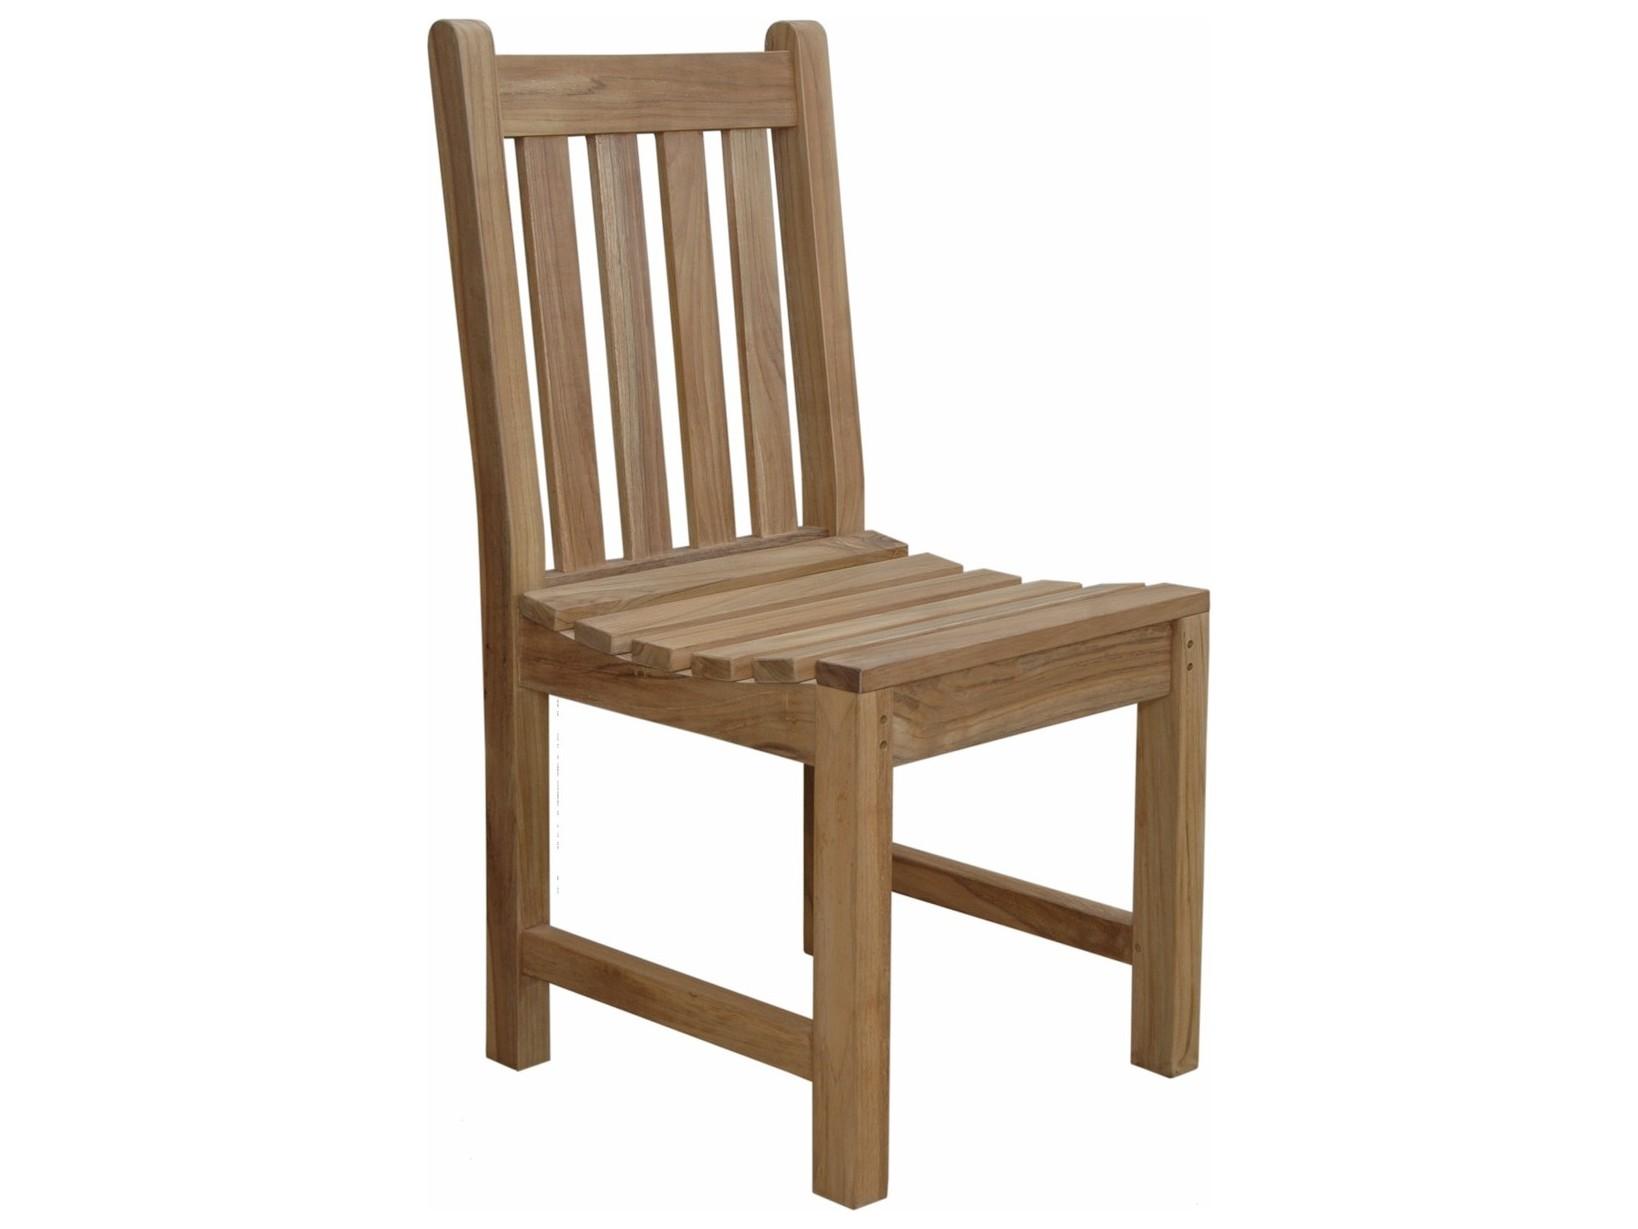 Anderson Teak Braxton Dining Chair Akchd2040